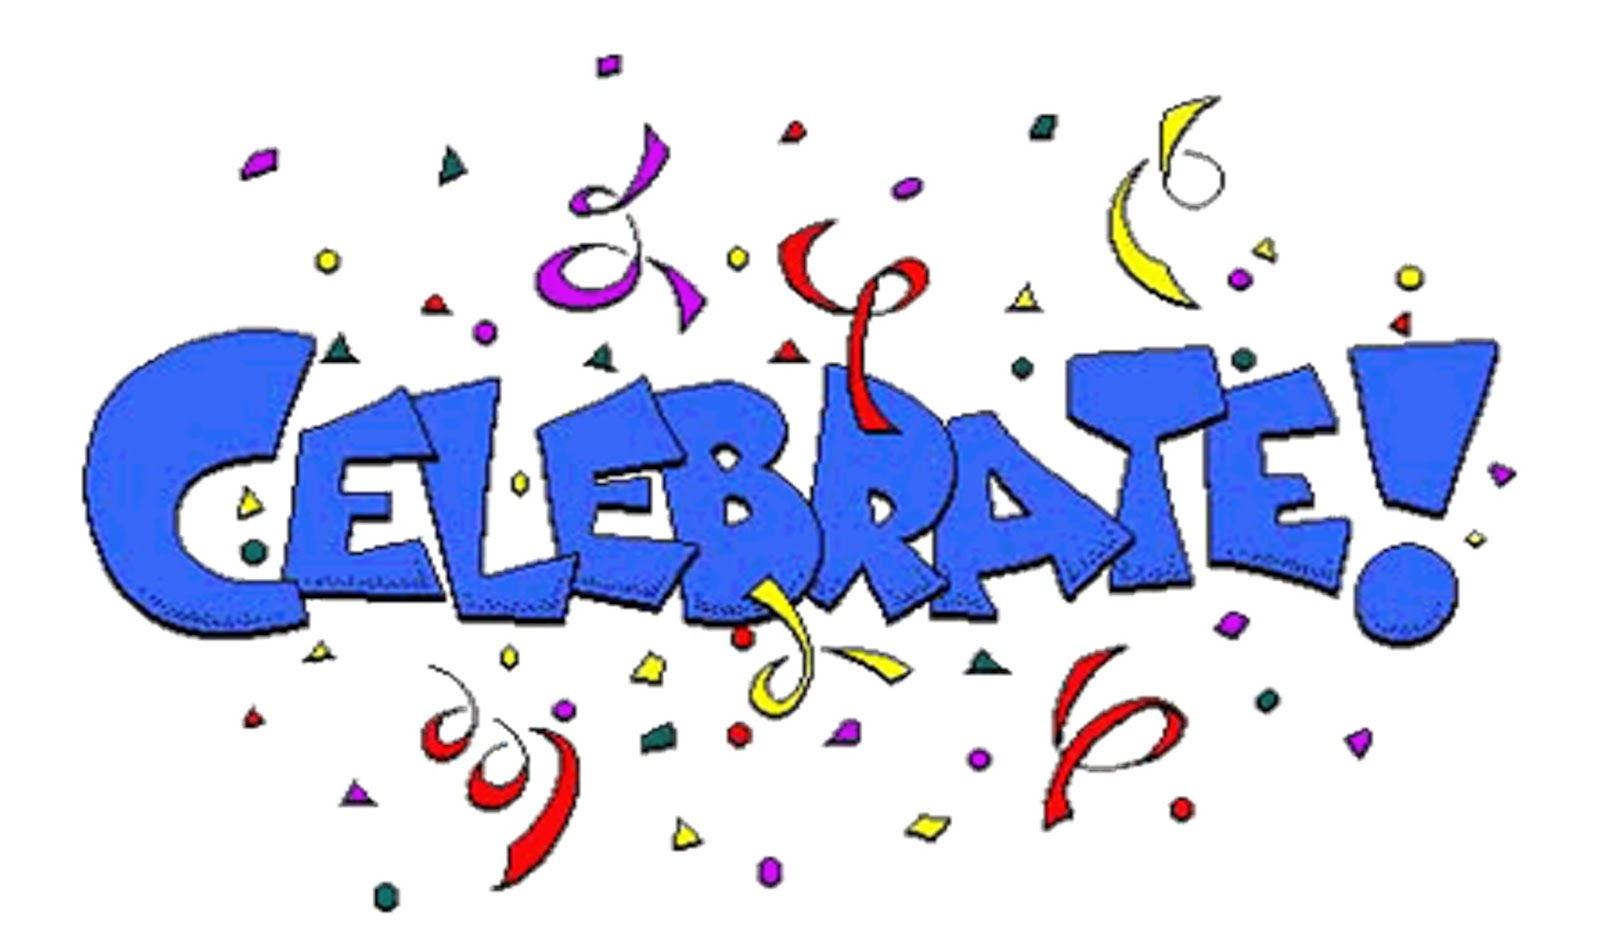 Celebration houston sports beat let cliparts